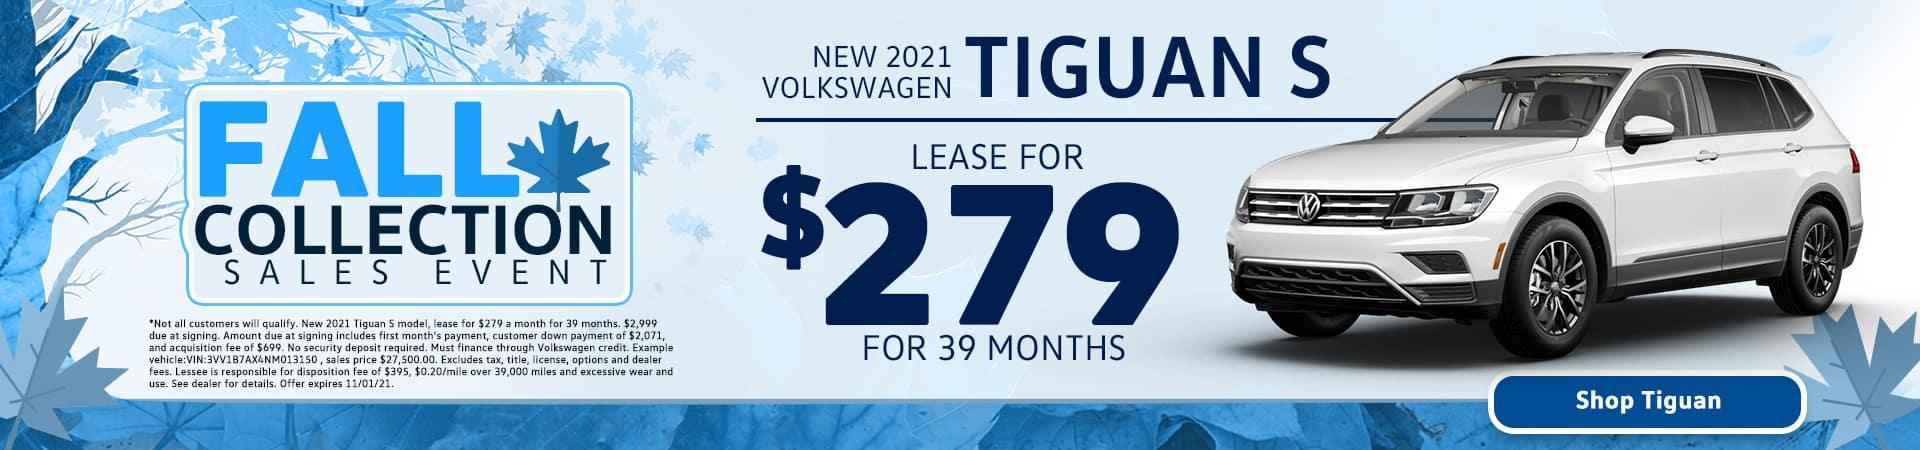 New 2021 Volkswagen Tiguan S for Sale in Tampa, FL